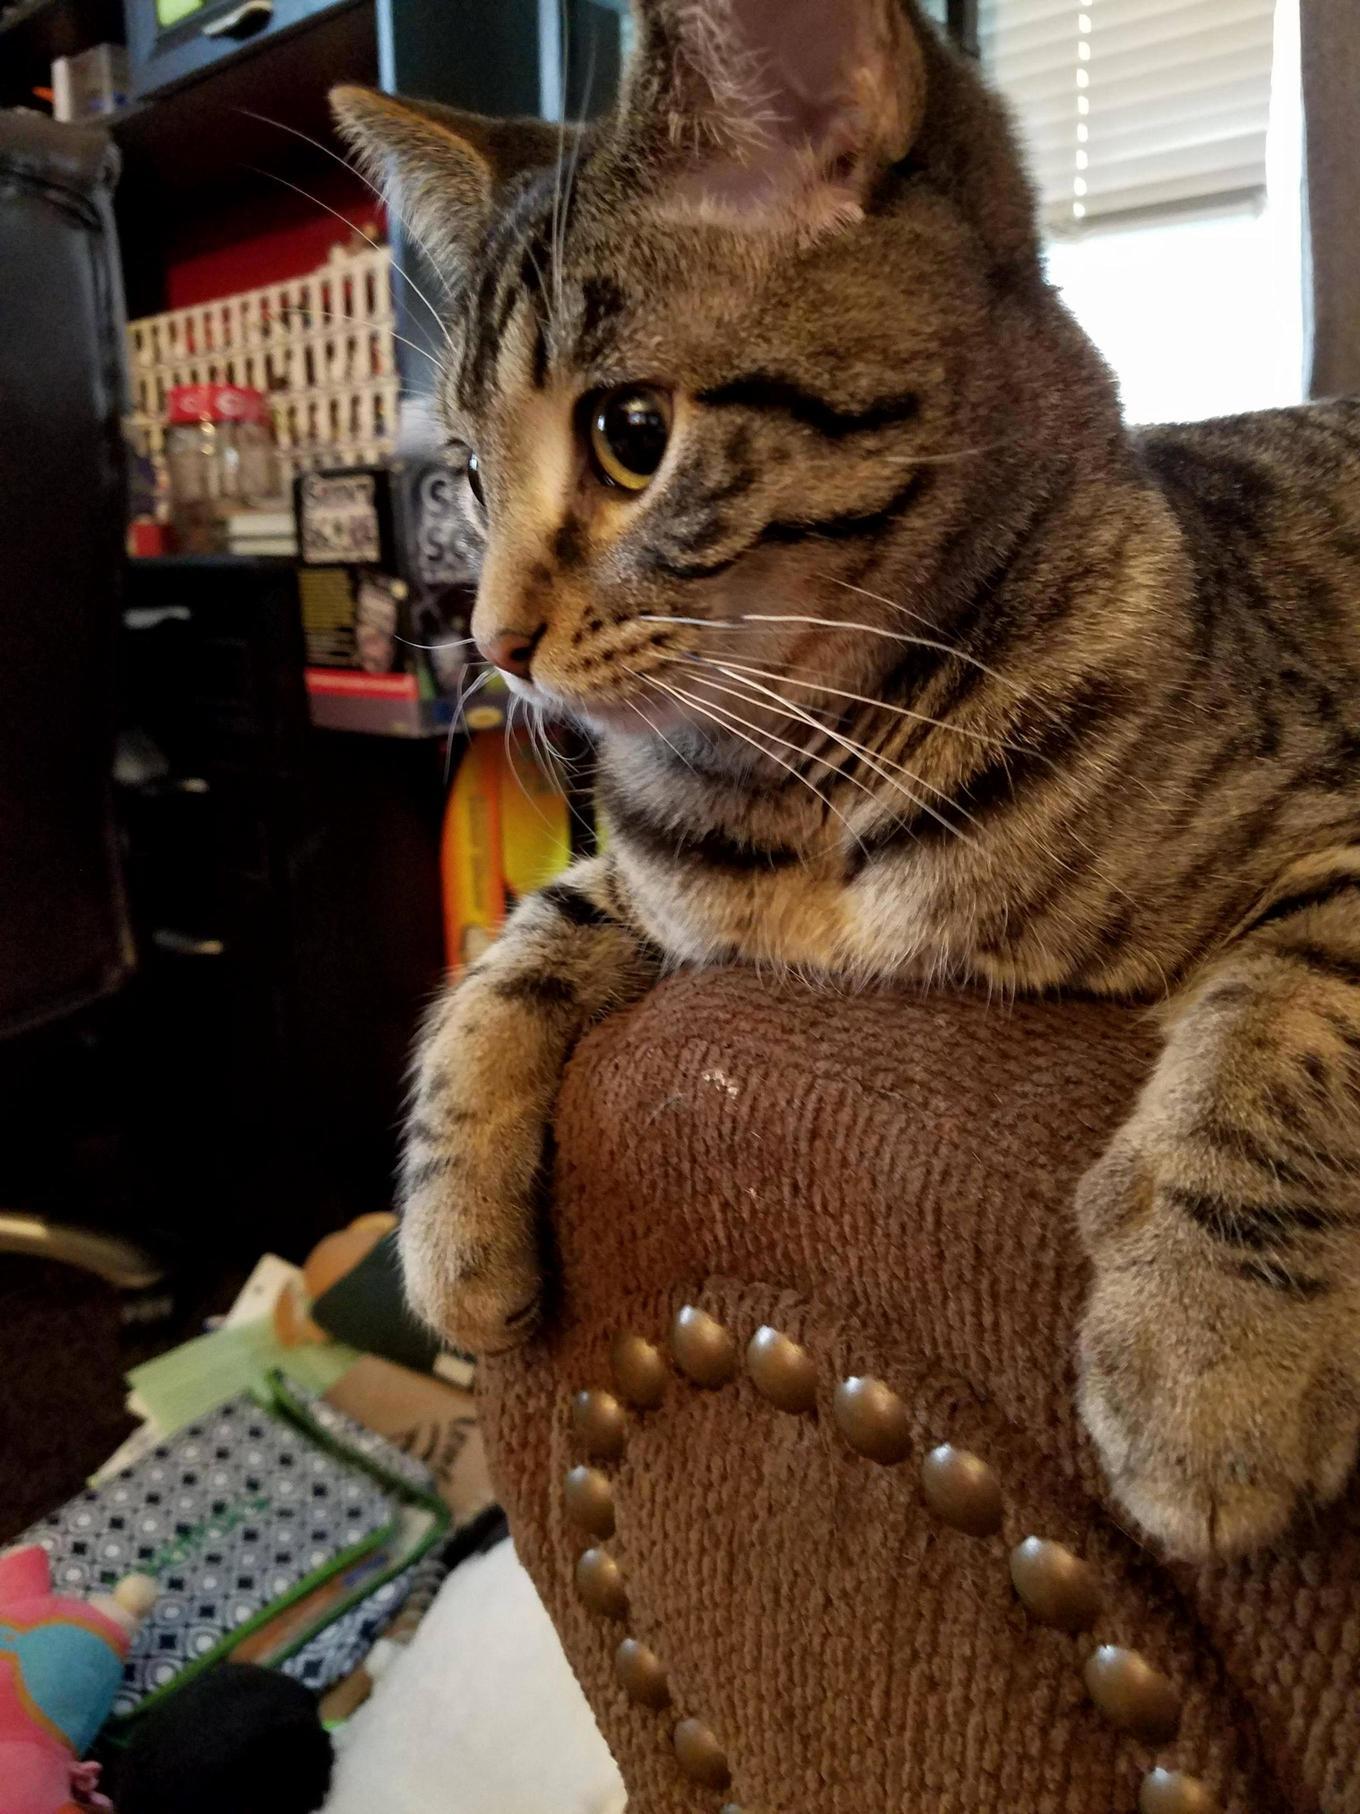 Prince lebowski surveys his kingdom. he is pleased.